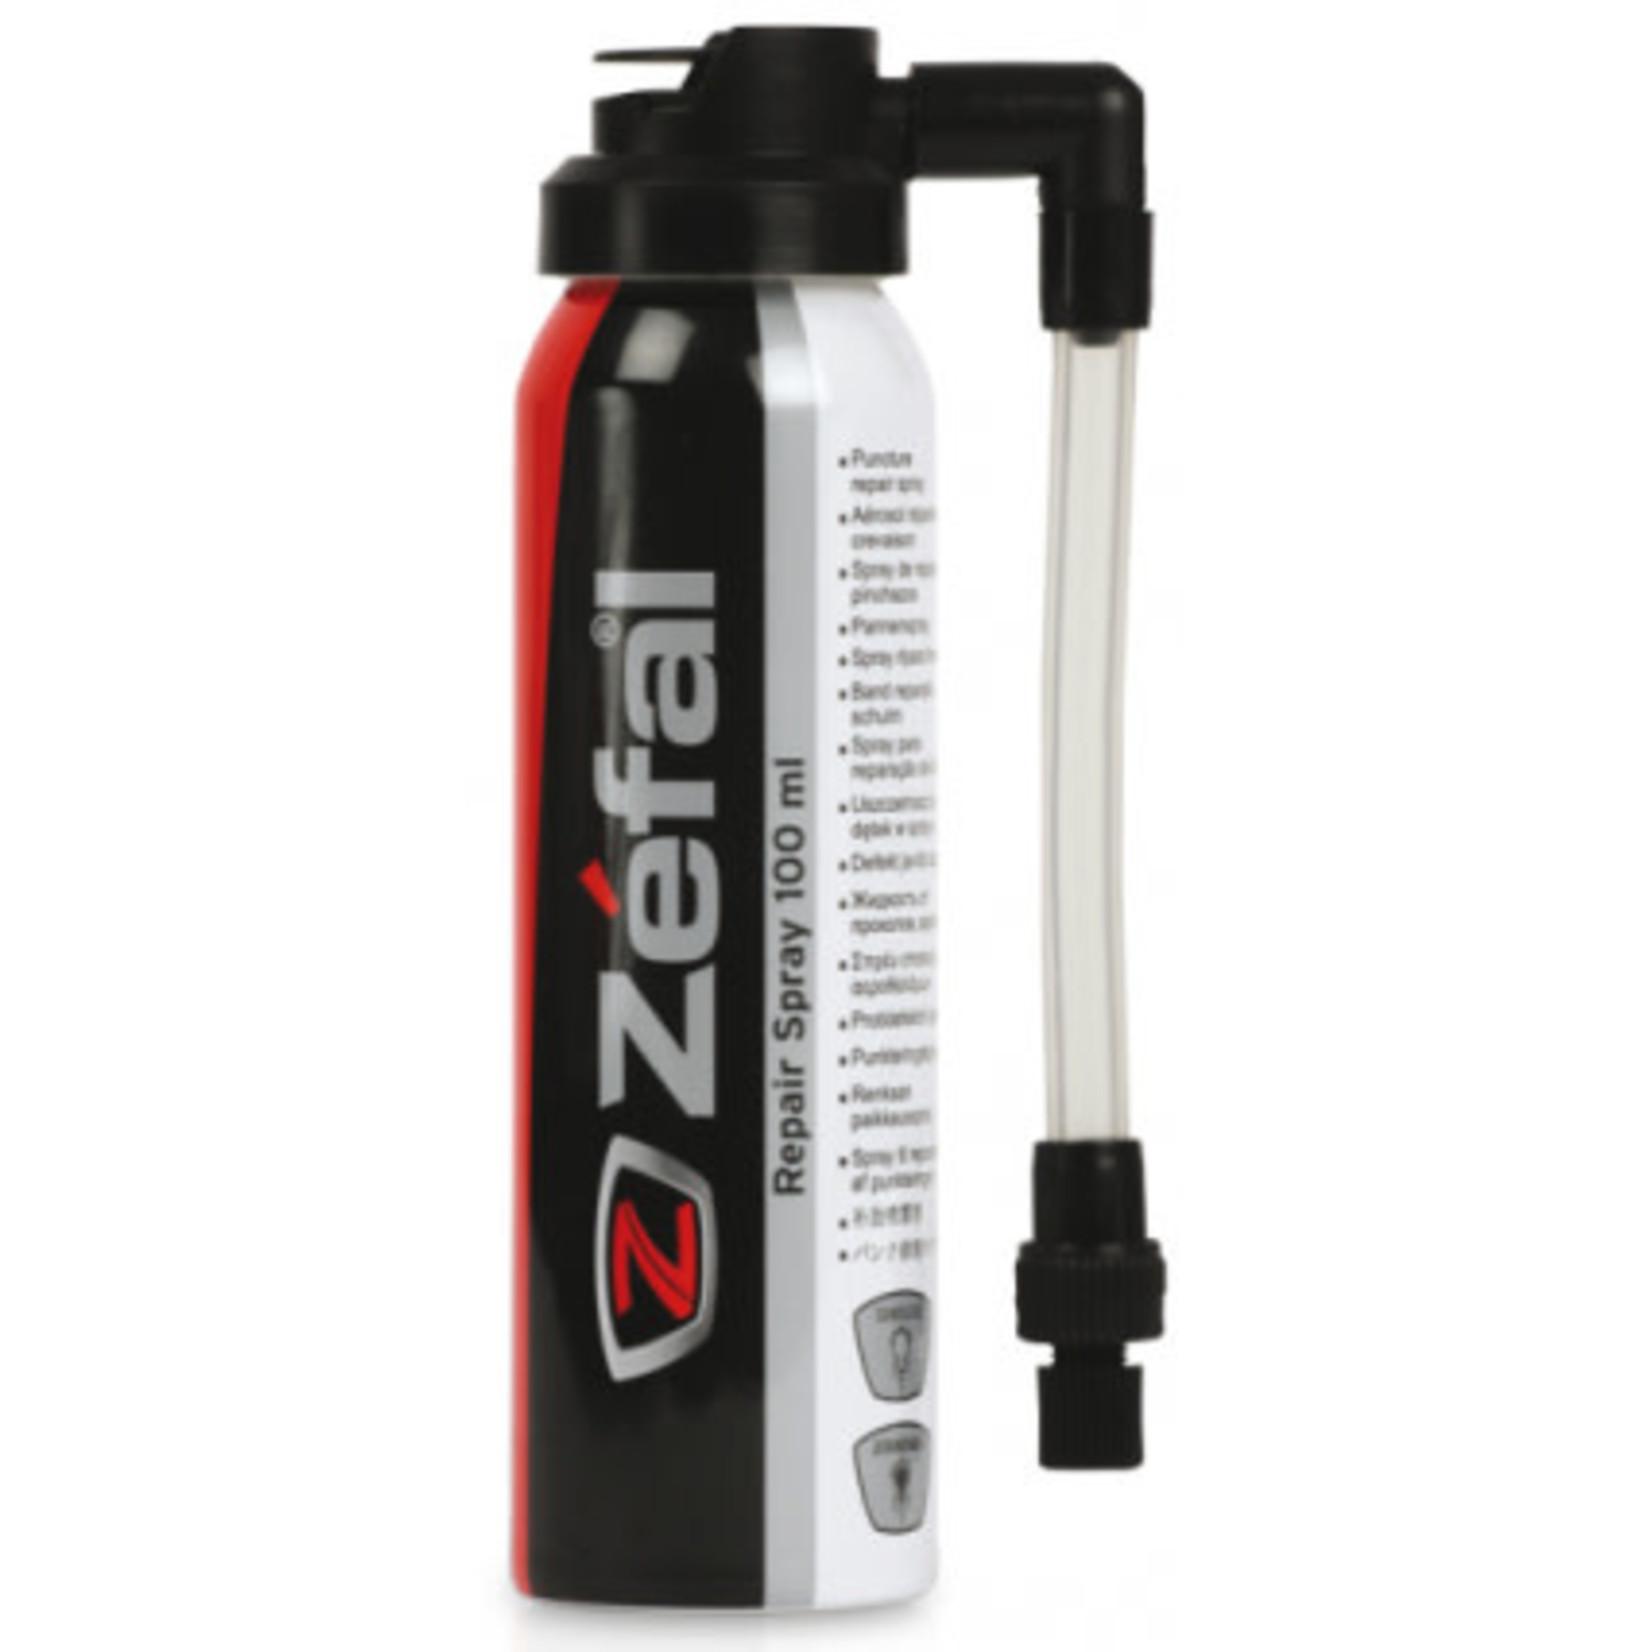 ZEFAL - Puncture repair spray 100ml